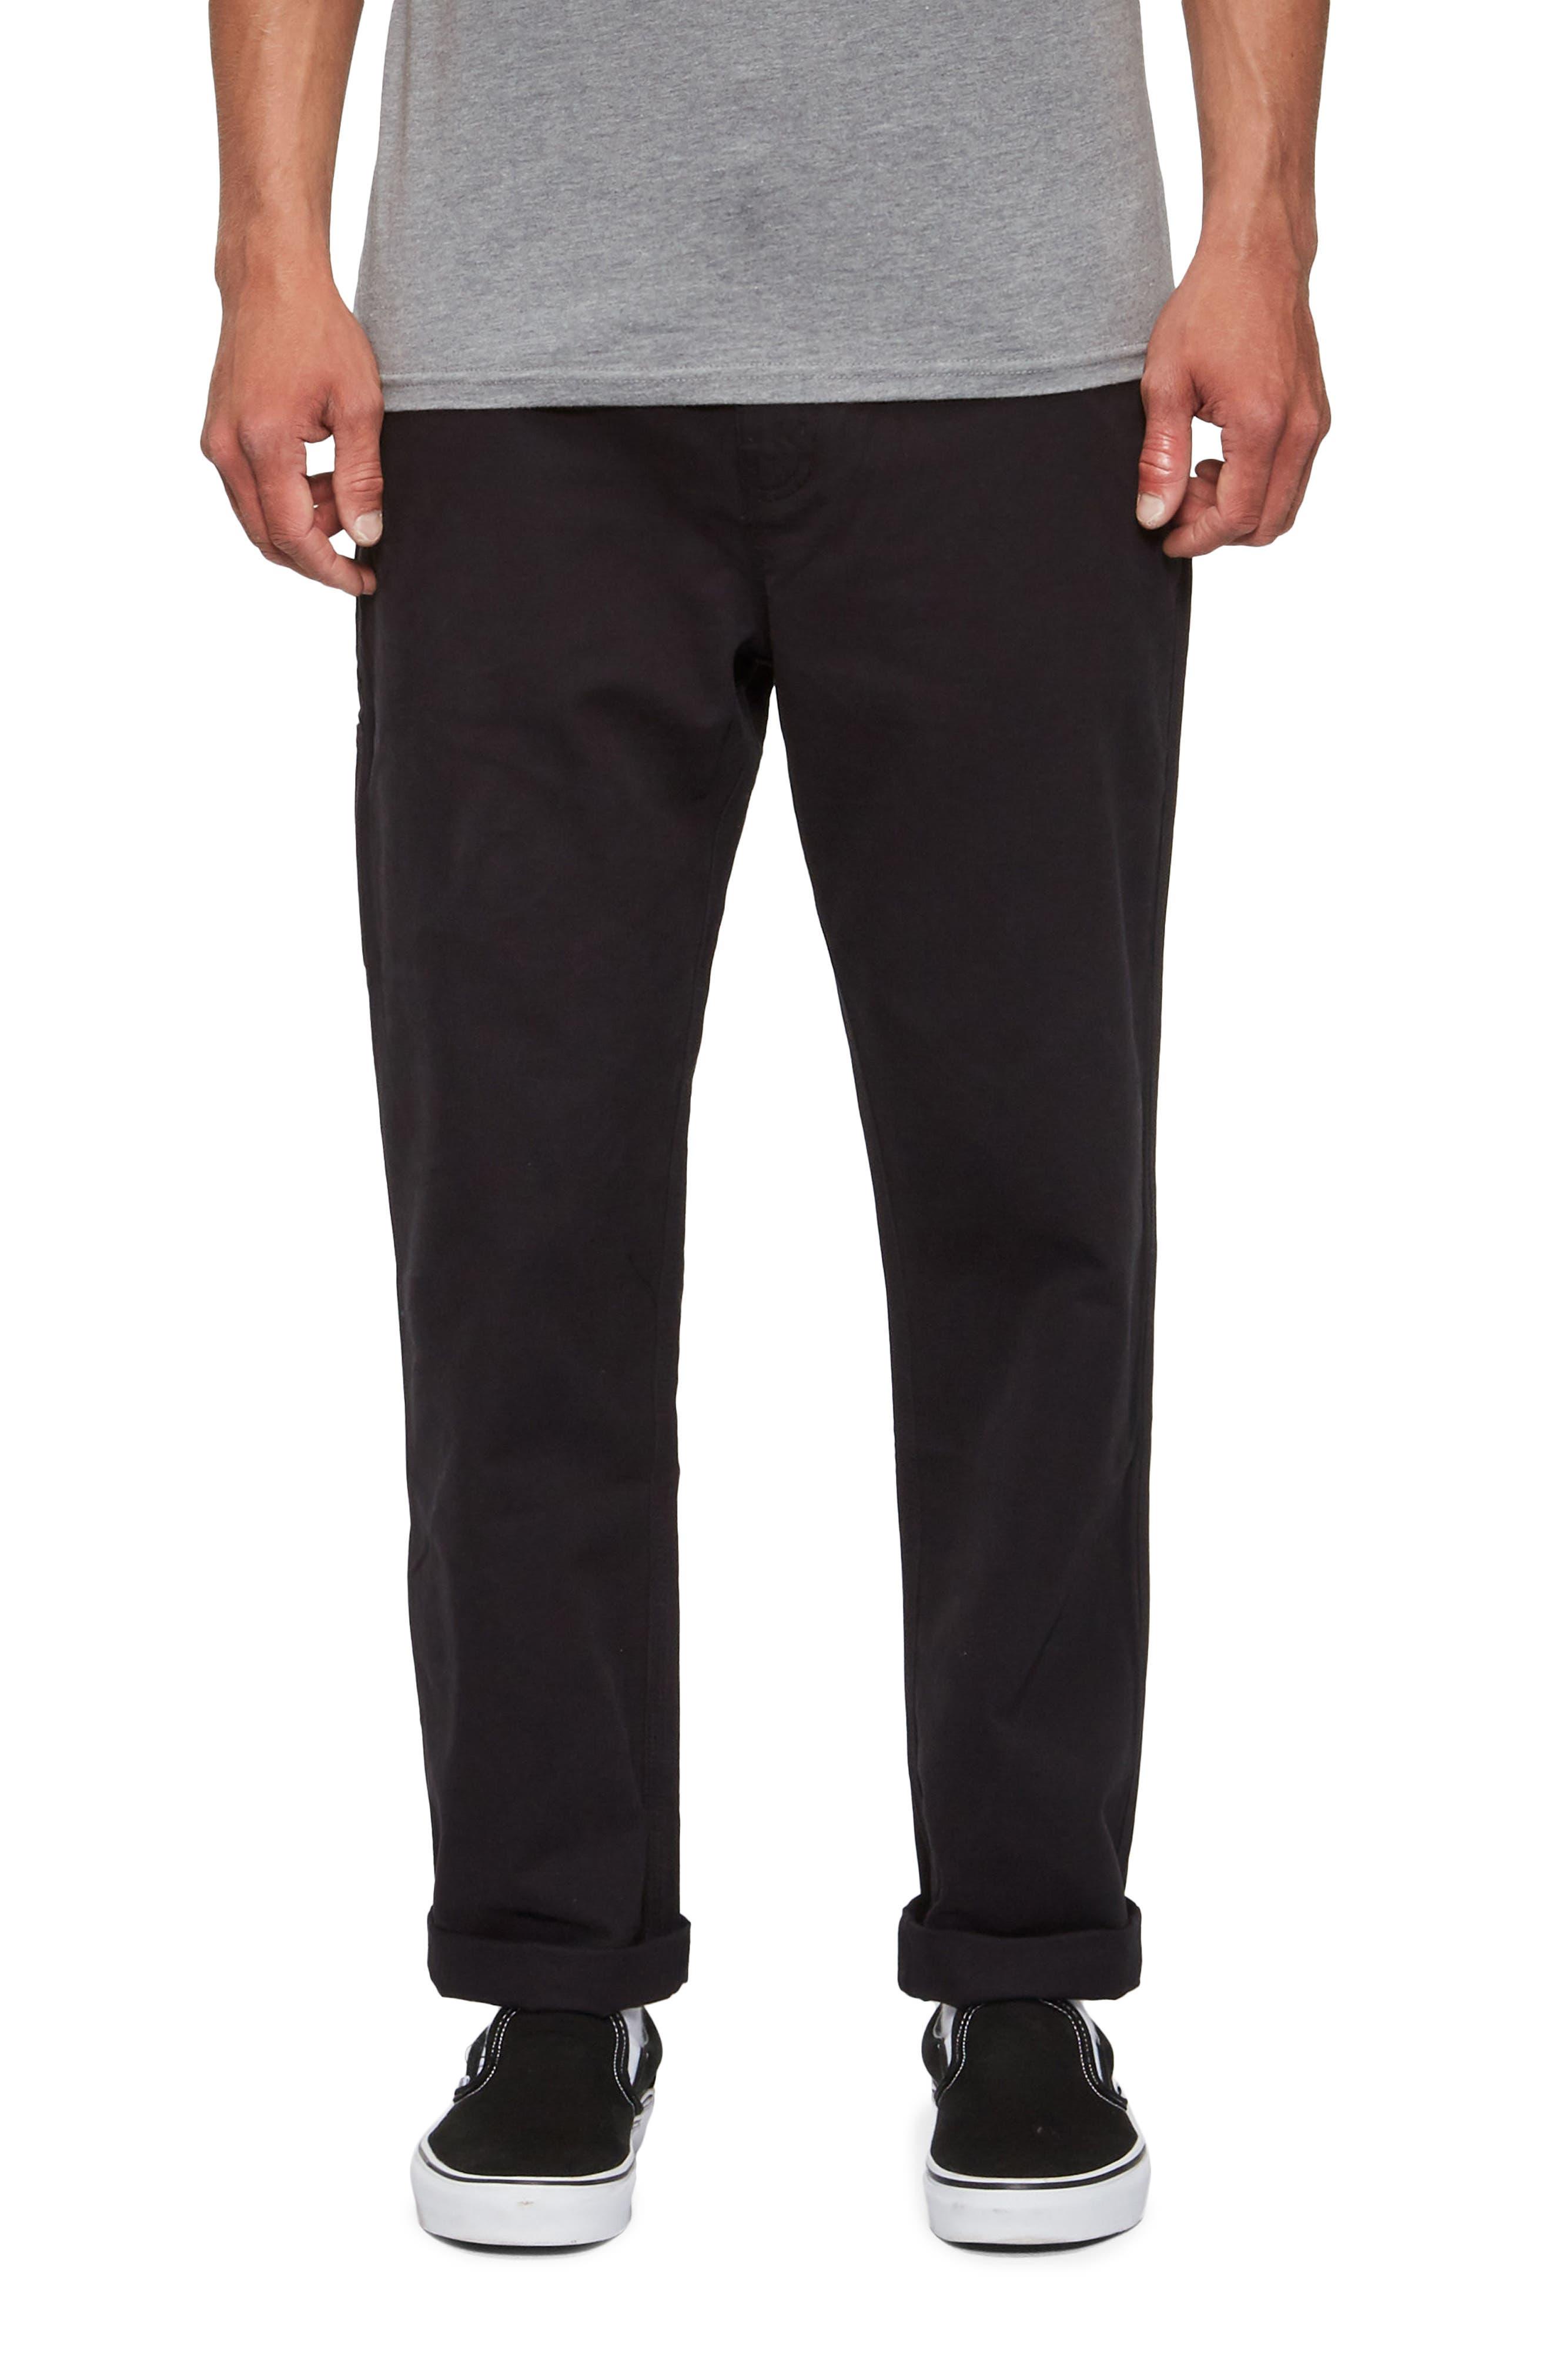 Westport Utility Pants,                             Main thumbnail 1, color,                             BLACK